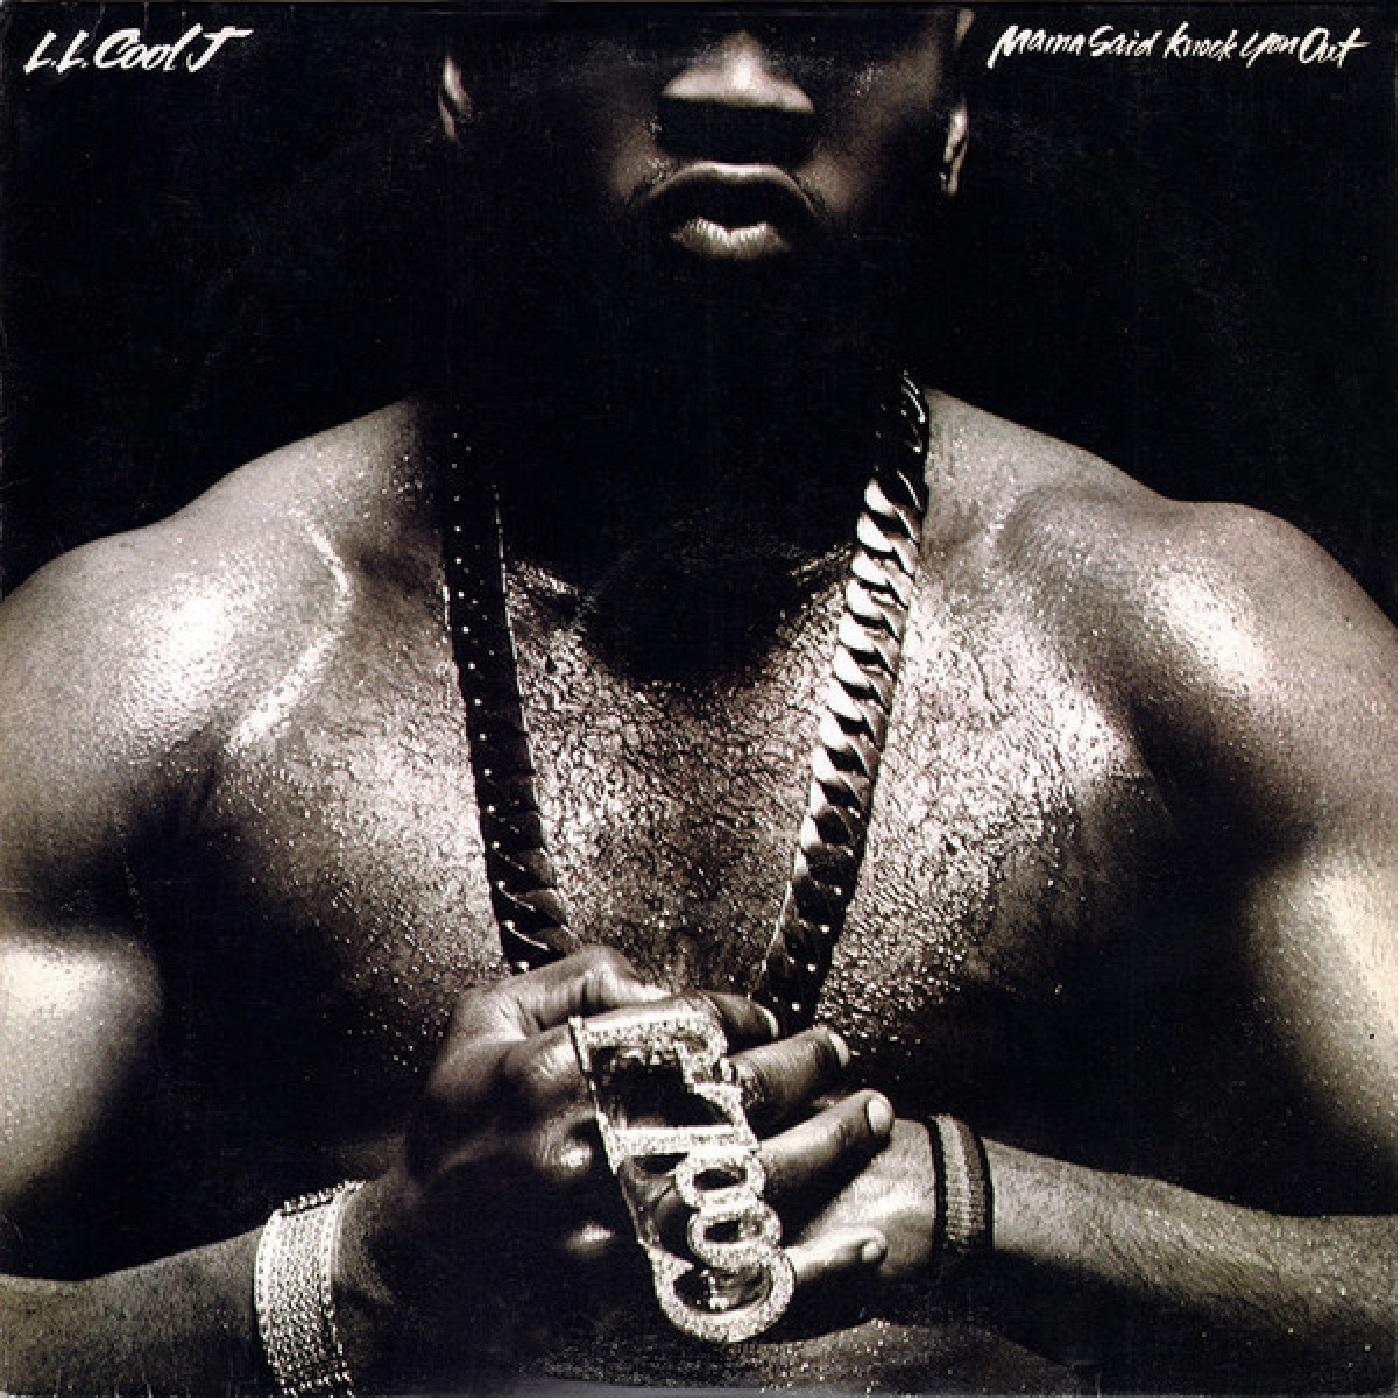 S03E01 - LL Cool J - Mama Said Knock You Out